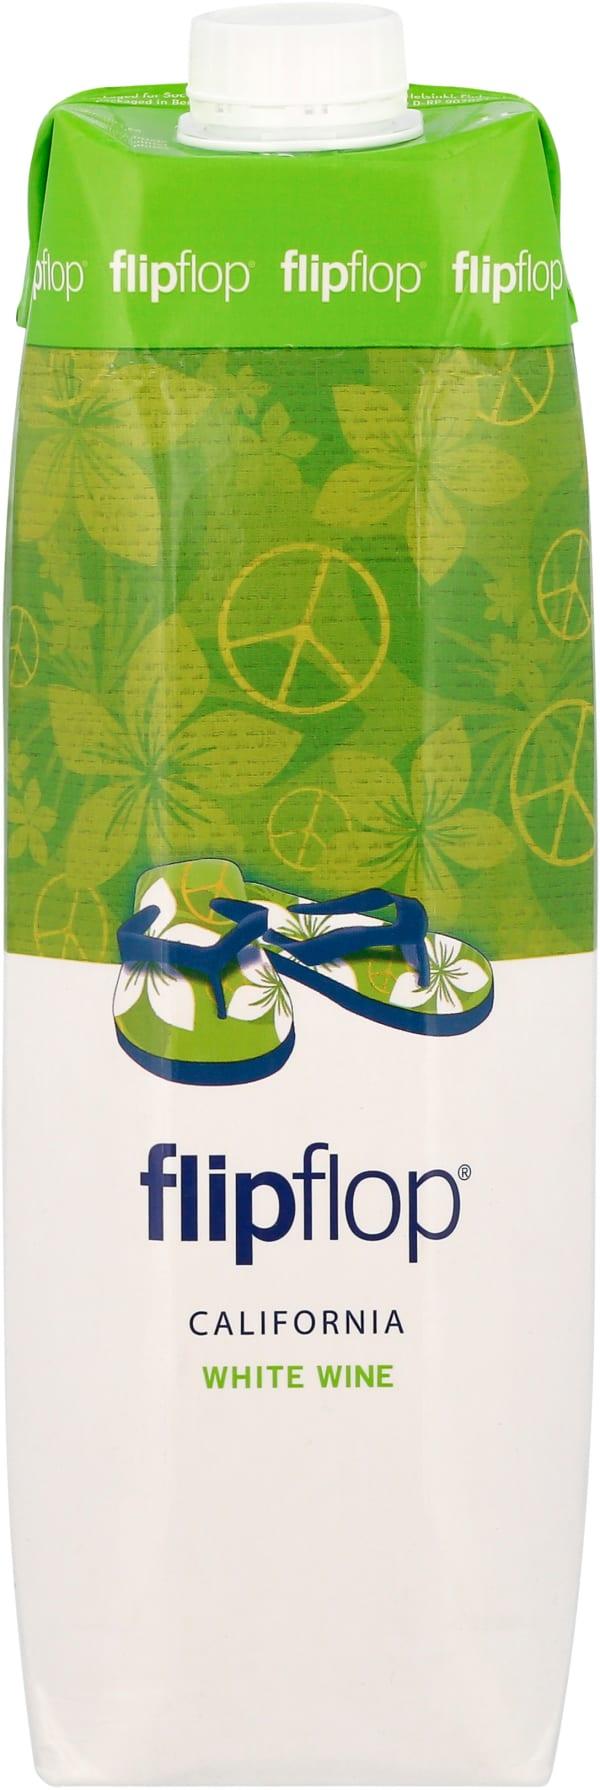 FlipFlop Californian White 2017 carton package